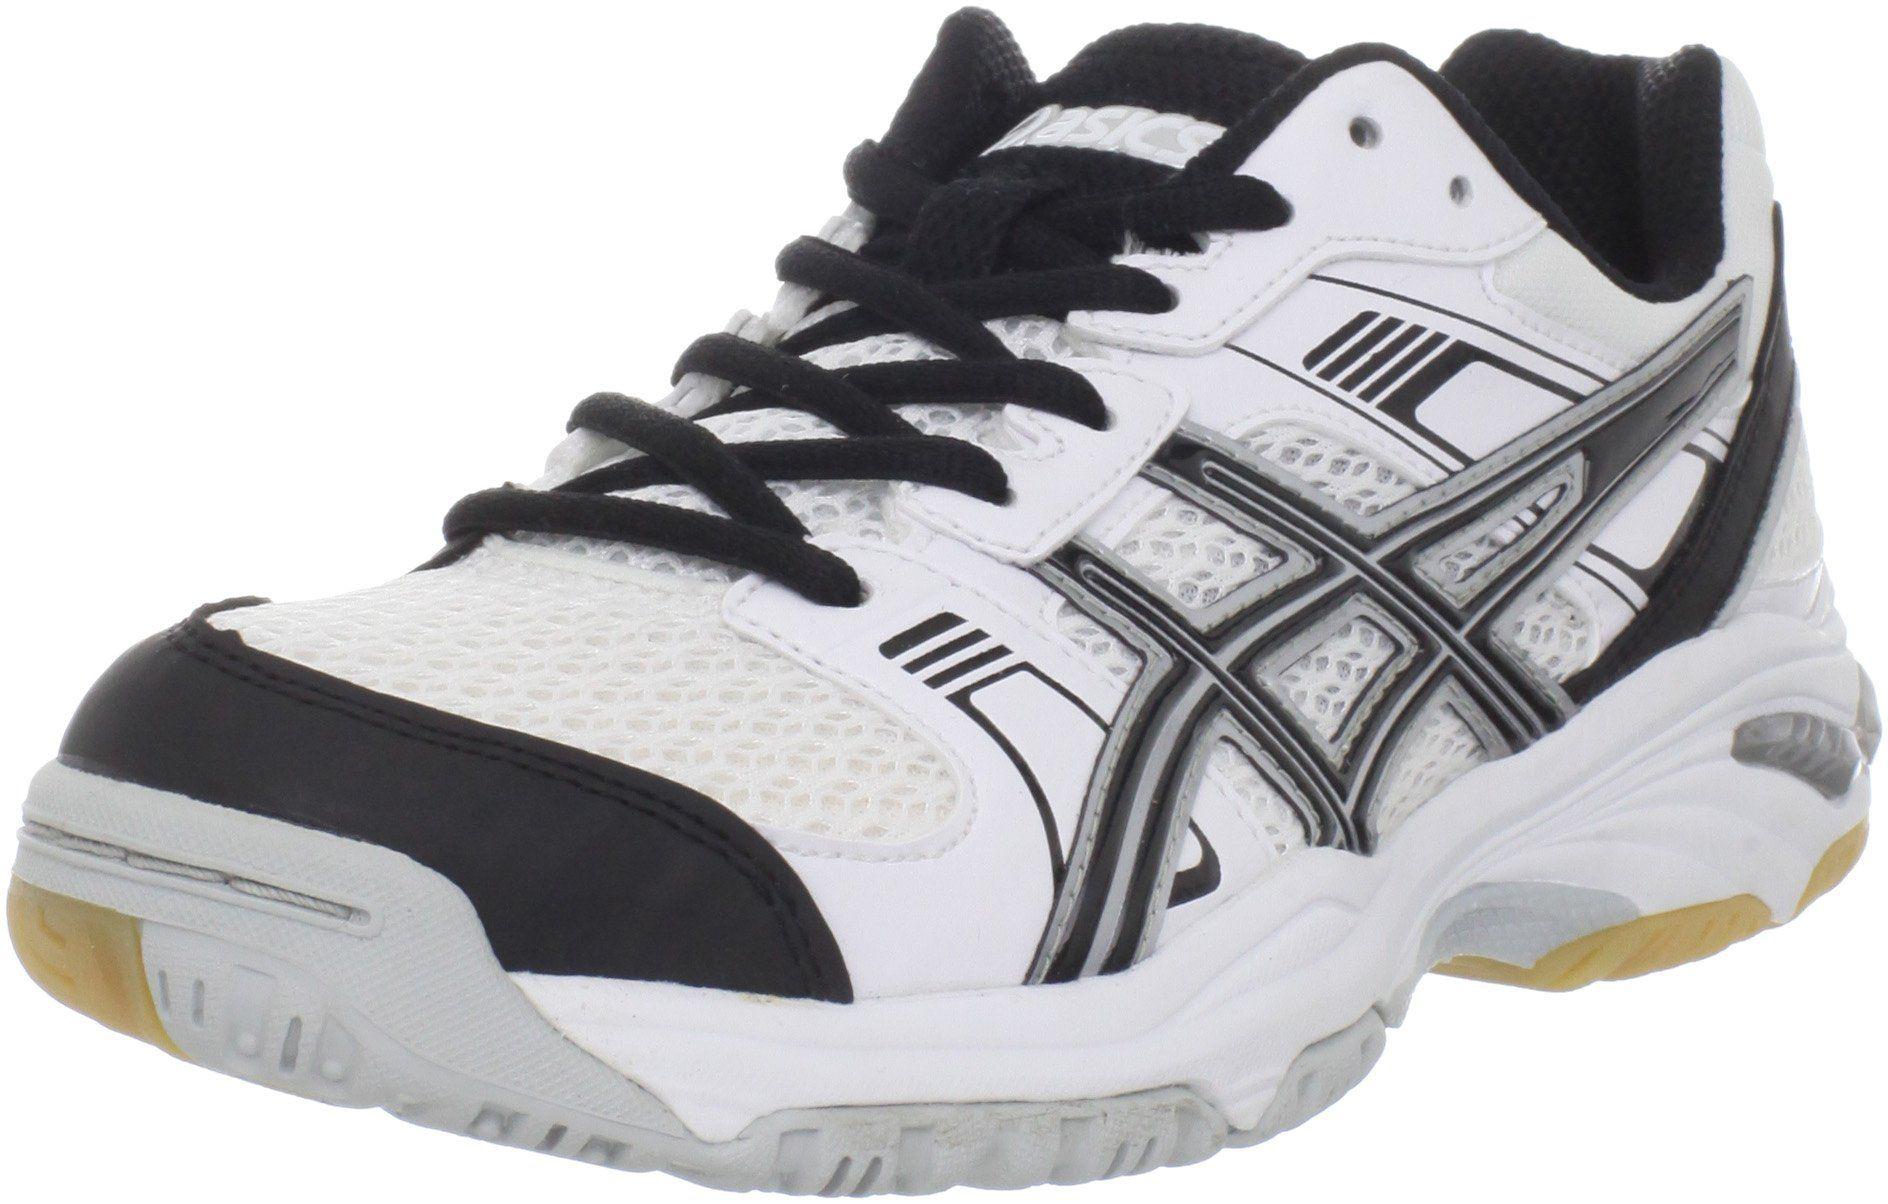 Asics Women S 1140 V Volleyball Shoe White Black Silver 9 5 M Us Gel Cushioning System Durasponge Outsole Volleyball Shoes Fashion Athletic Shoes Asics Women